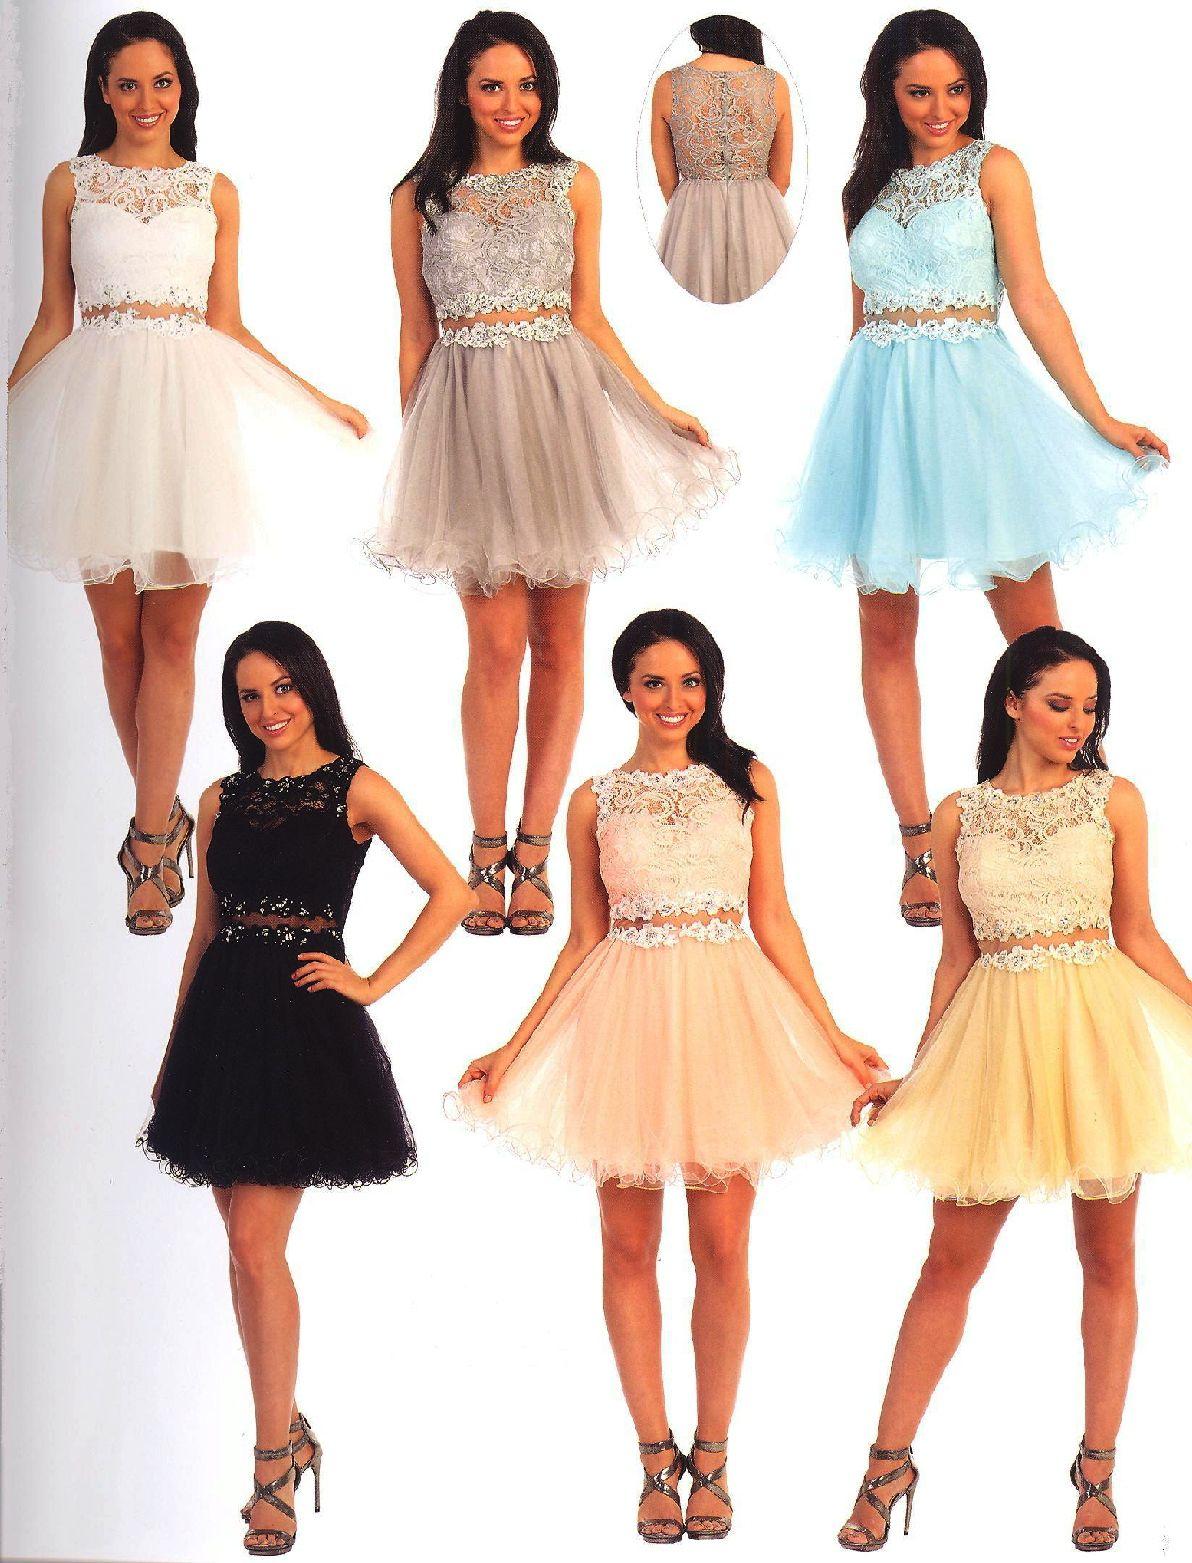 Homecoming dresses sweet dresses under ucbrueucbruesheer